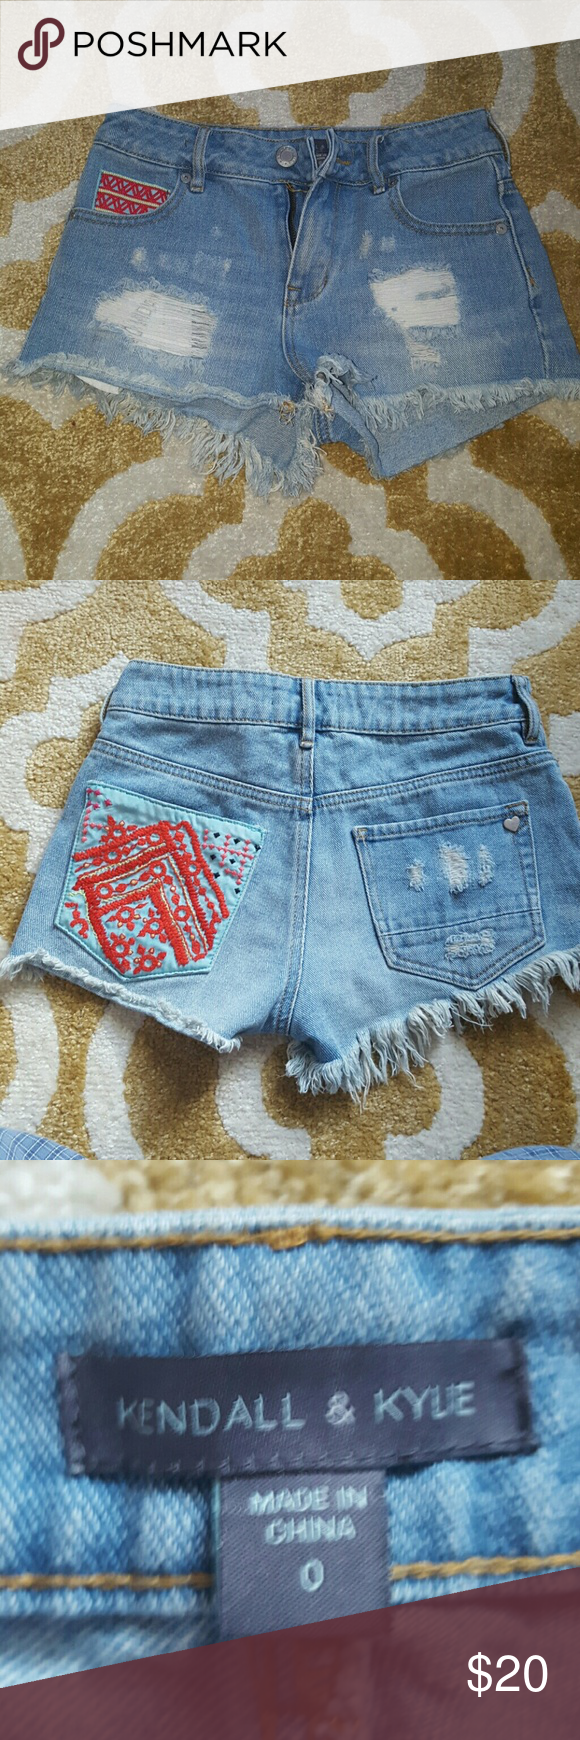 KENDALL & KYLIE DENIM HIGH WAISTED SHORTS Size 0, good condition! Kendall & Kylie Shorts Jean Shorts